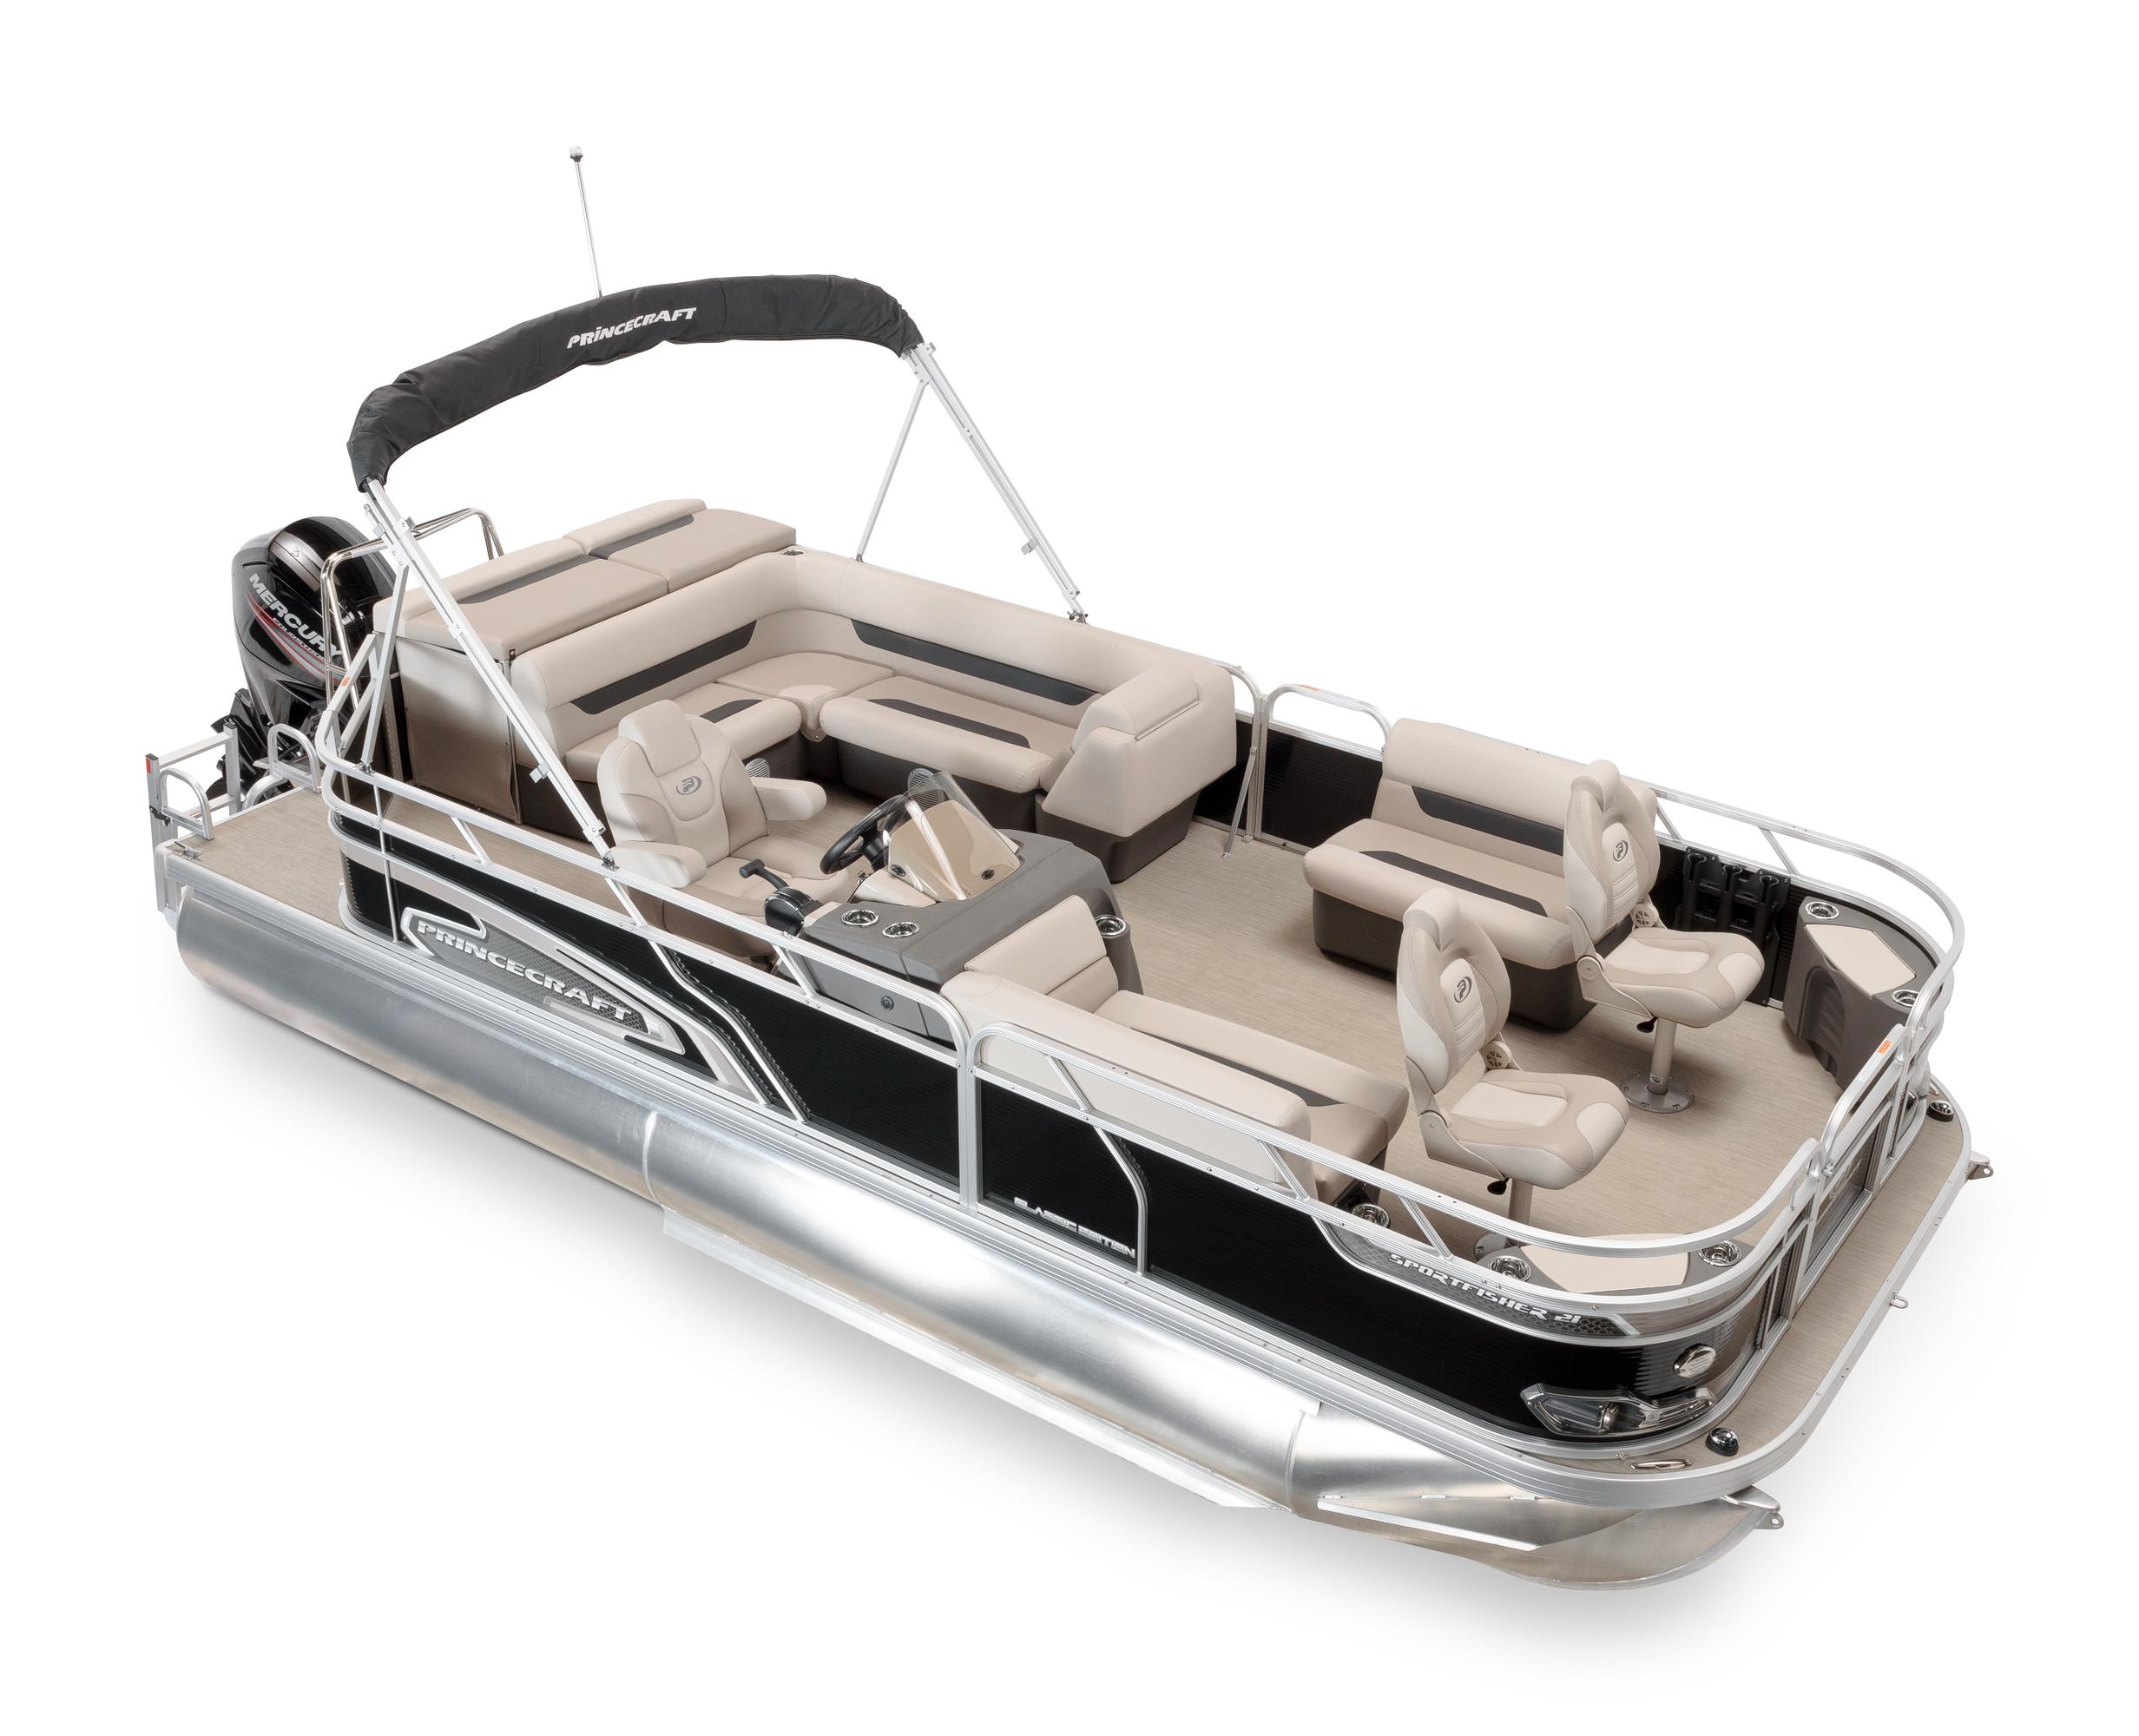 Rentals Brown's Marina Department Pontoon Fishing Boat